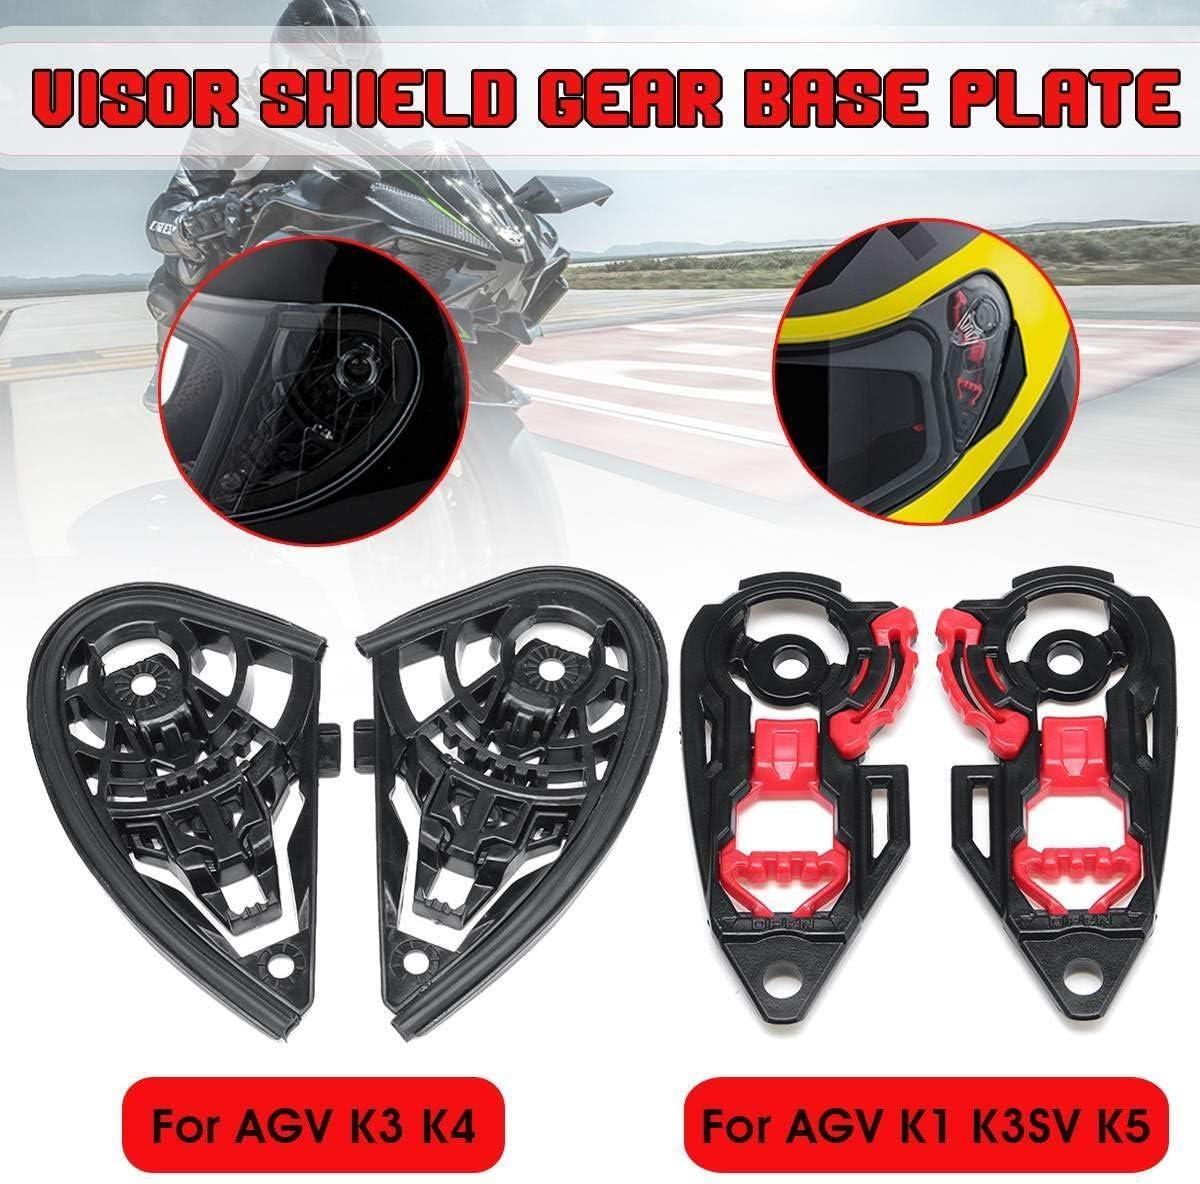 1pair Casque de Moto Visor Bouclier de Vitesse Plaque de Base Support de lentille for K1 AGV K3SV K5 K4 Couleur : K1 K3SV K5 NO LOGO FJY-Visor K3